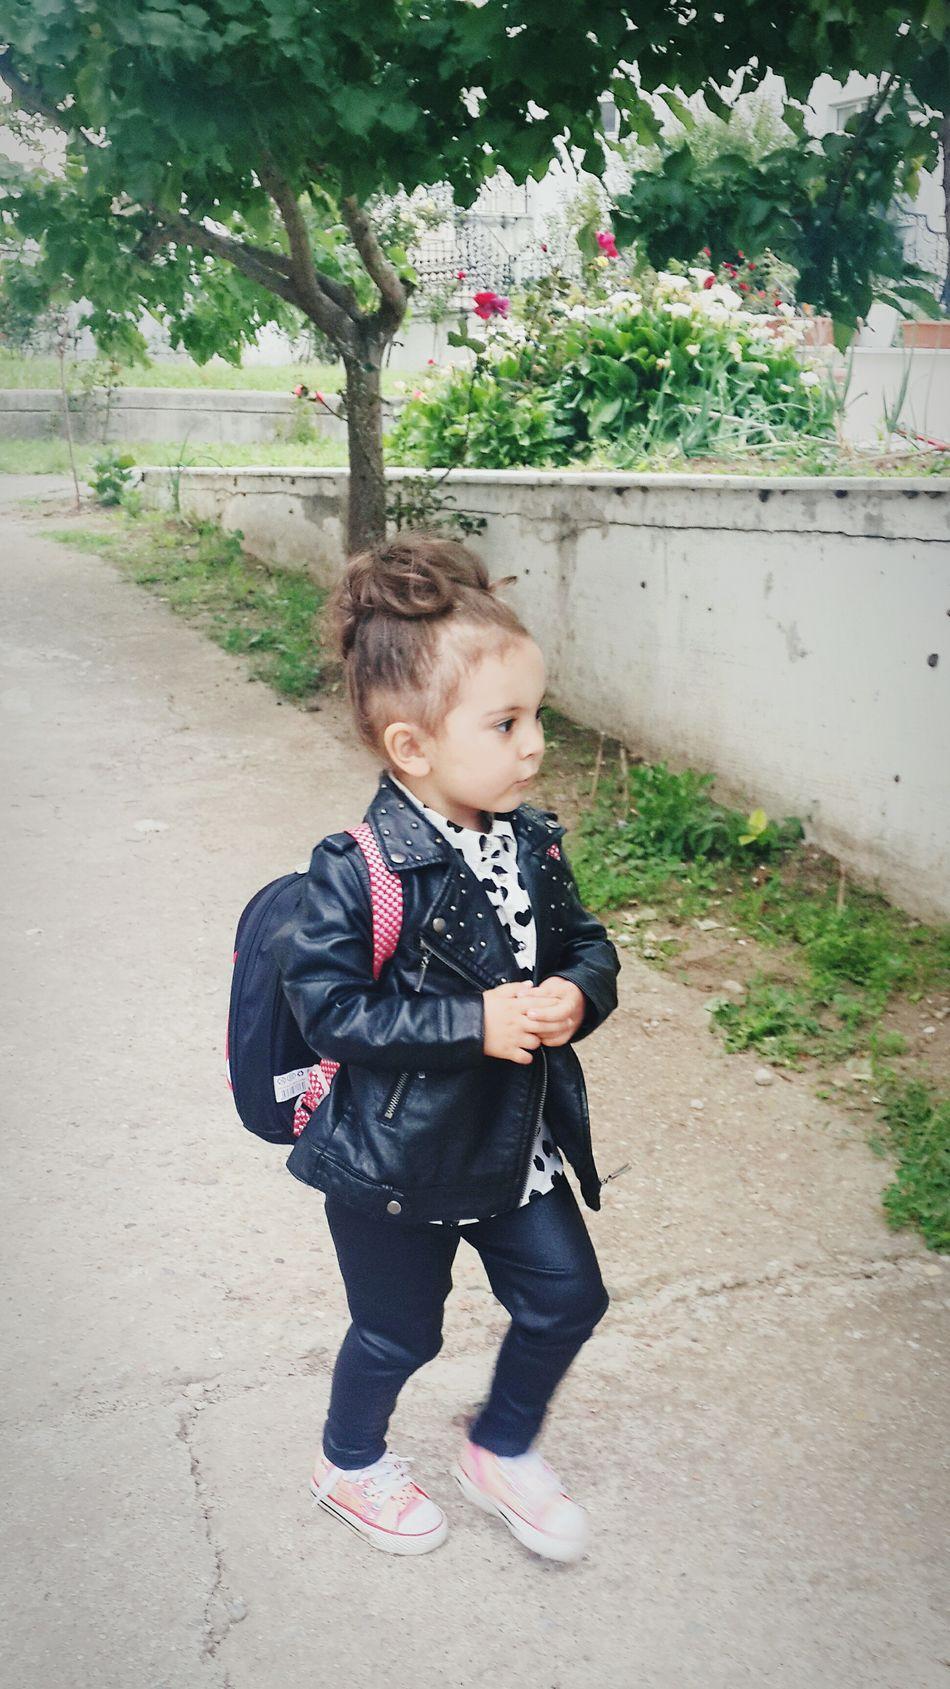 Baby Babygirl BabyBabyDont Babybabybabybaby Babybabybabyfashion Fashion Fashion&love&beauty Fashionblogger Fashion #style #stylish #love #TagsForLikes #me #cute #photooftheday #nails #hair #beauty #beautiful #instagood #instafashion # First Eyeem Photo